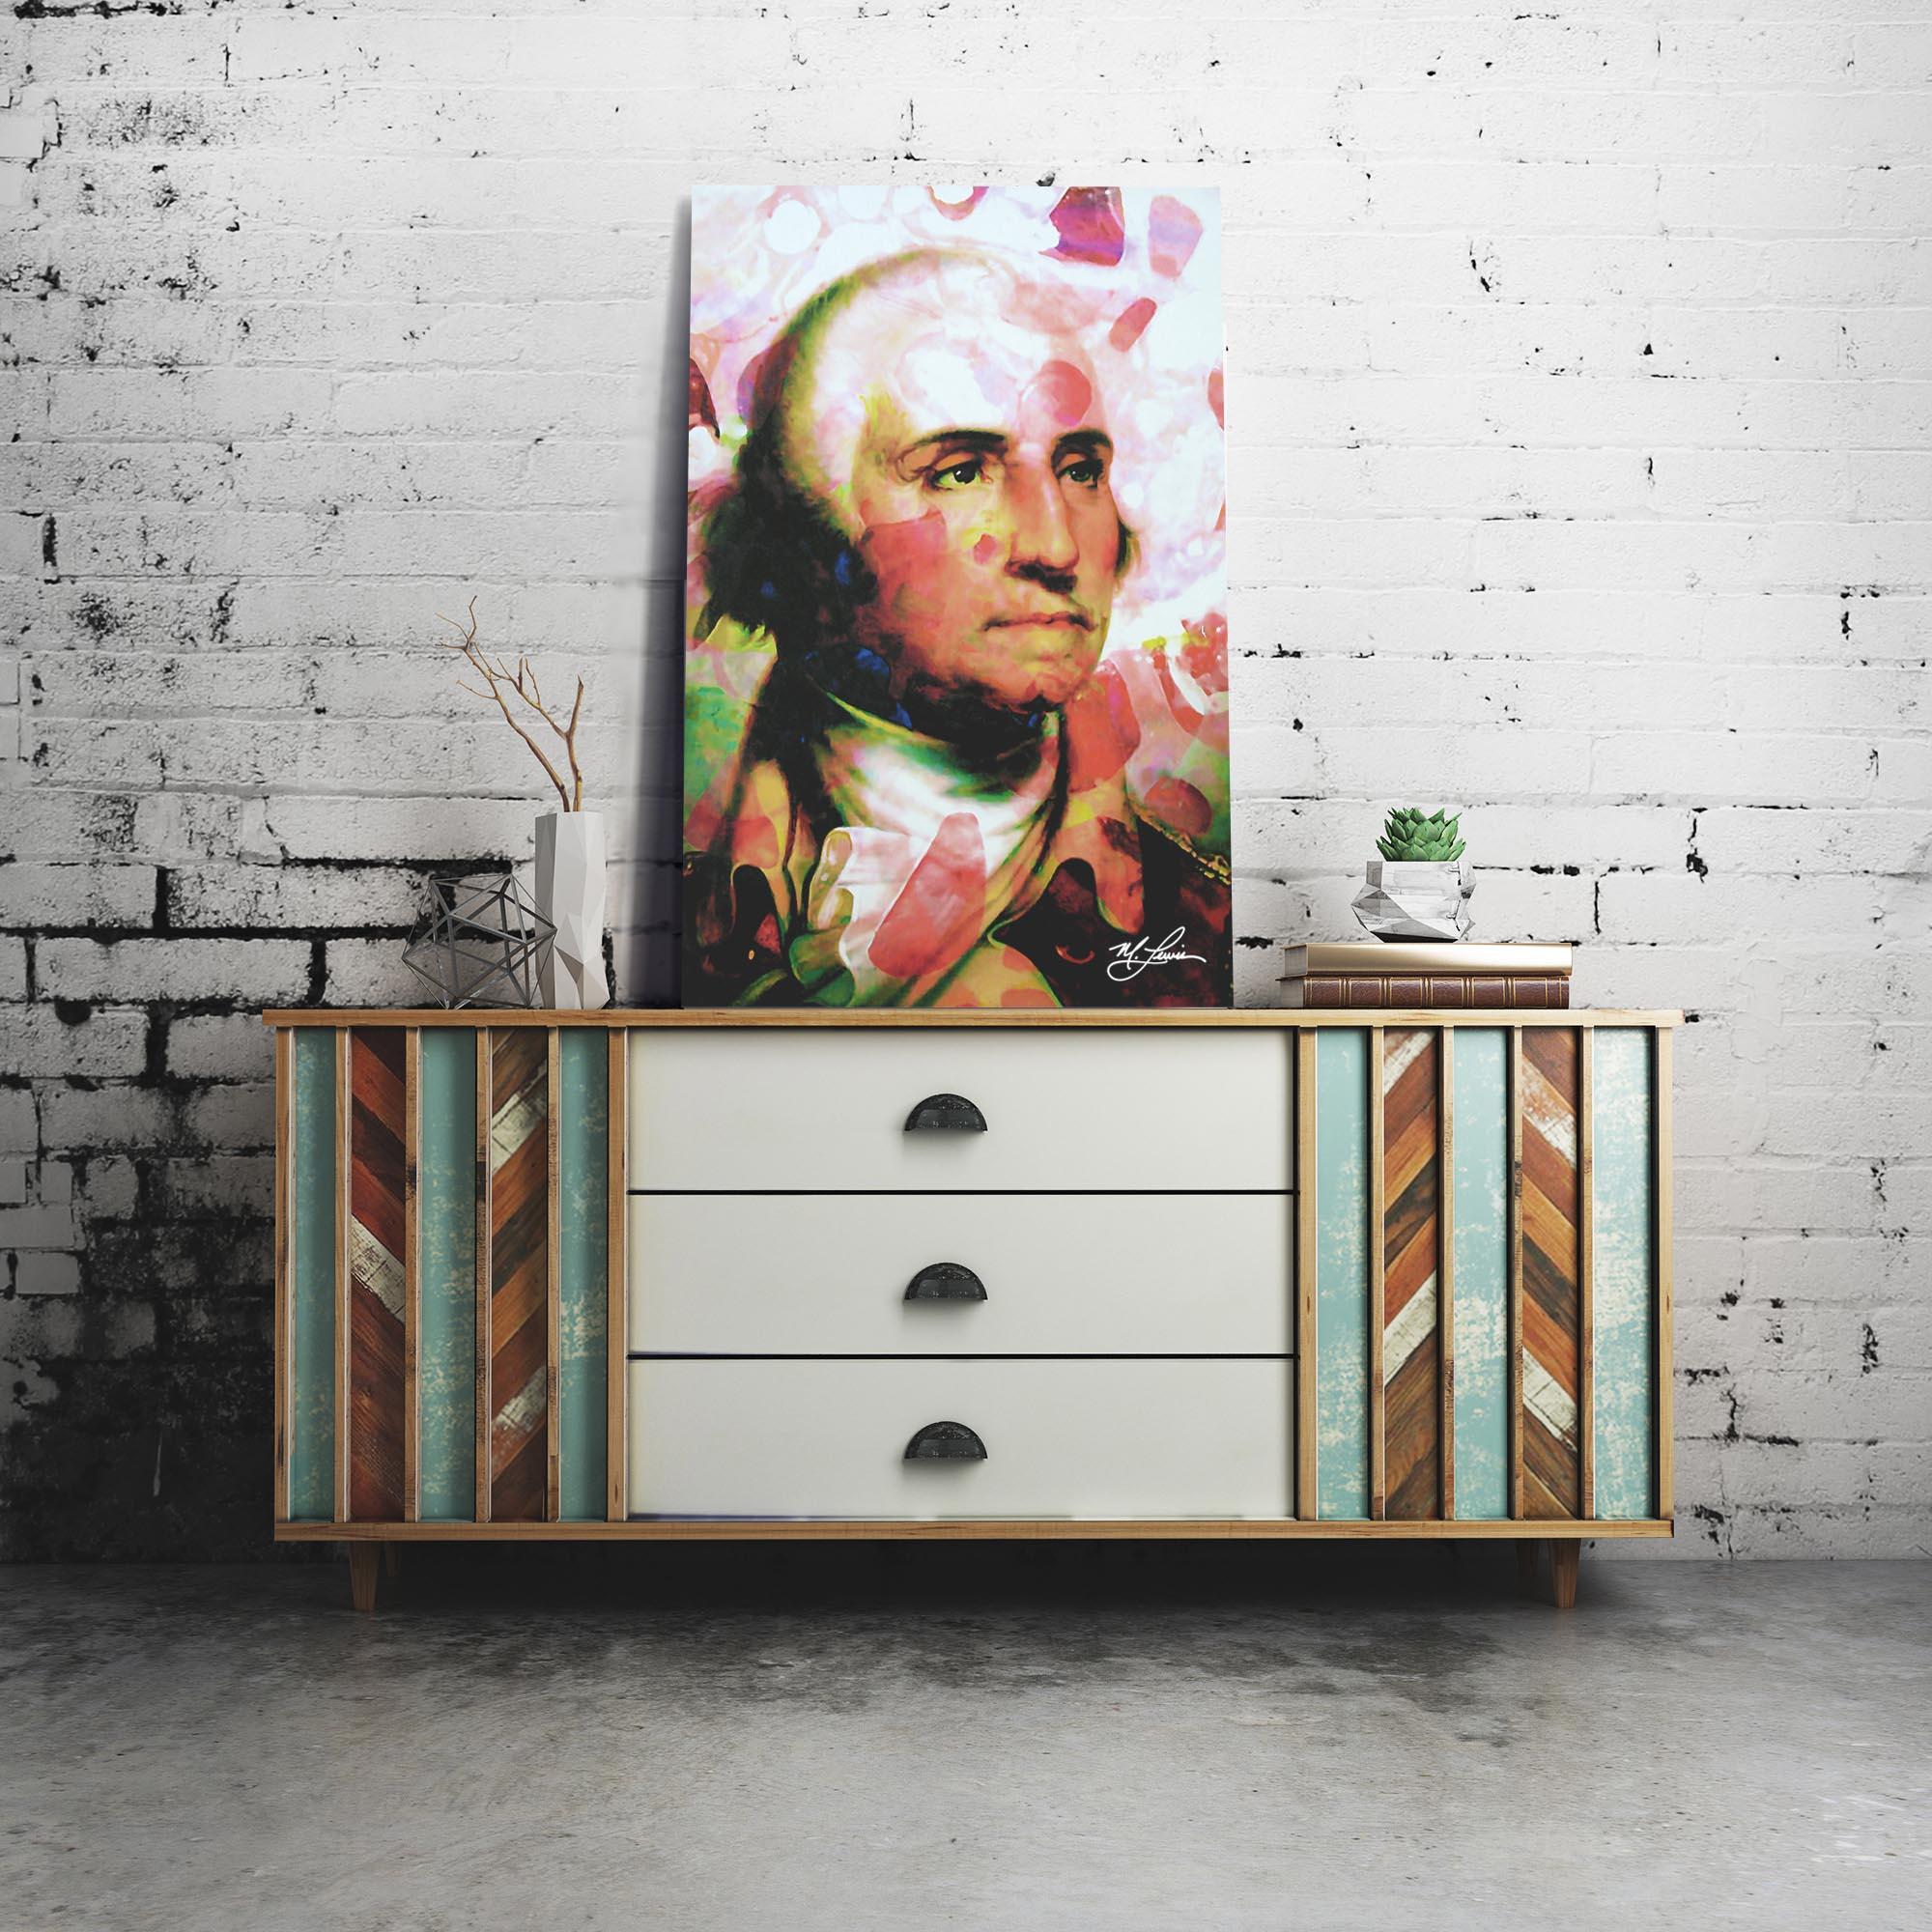 George Washington Disciplined Soul by Mark Lewis - Celebrity Pop Art on Metal or Plexiglass - ML0040